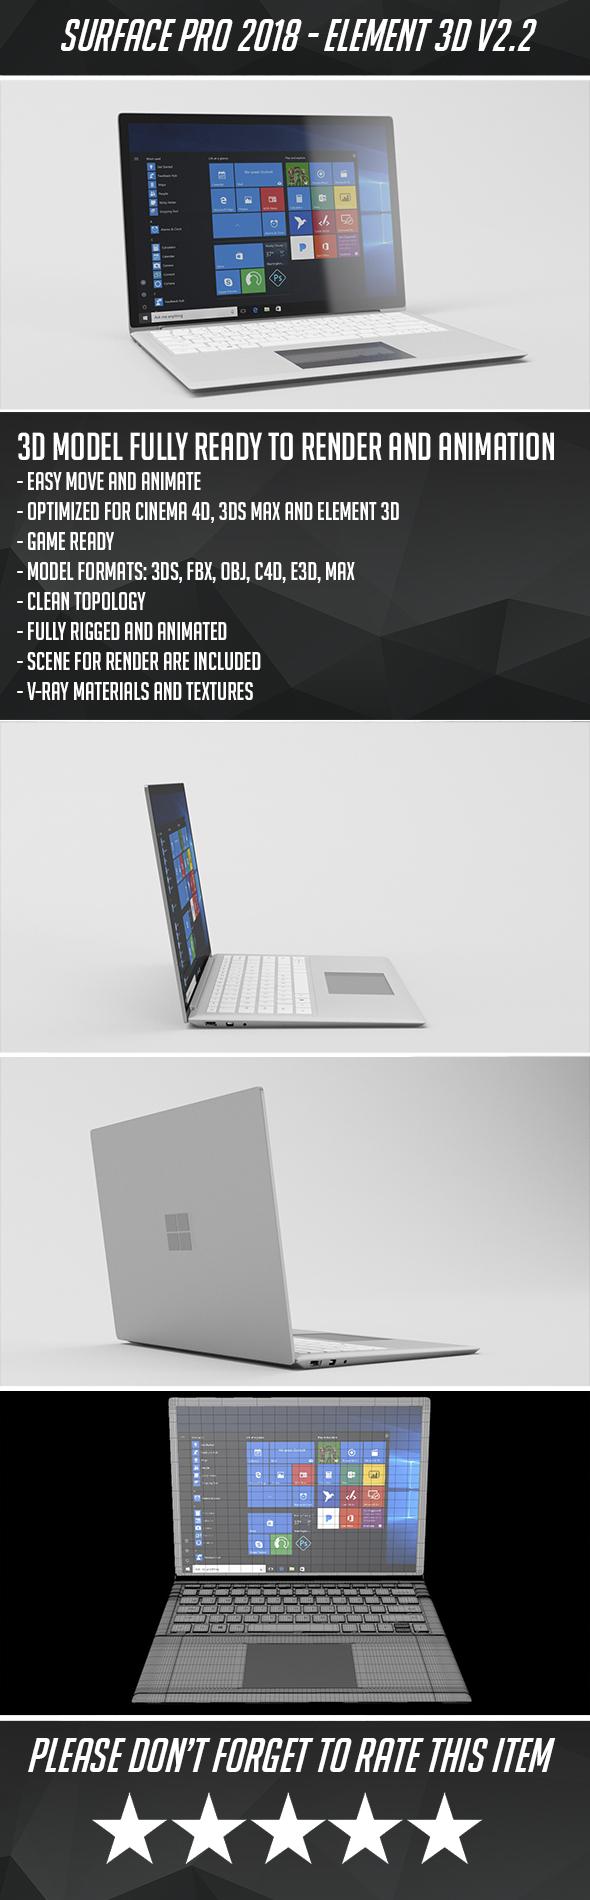 Surface Laptop Pro 2018